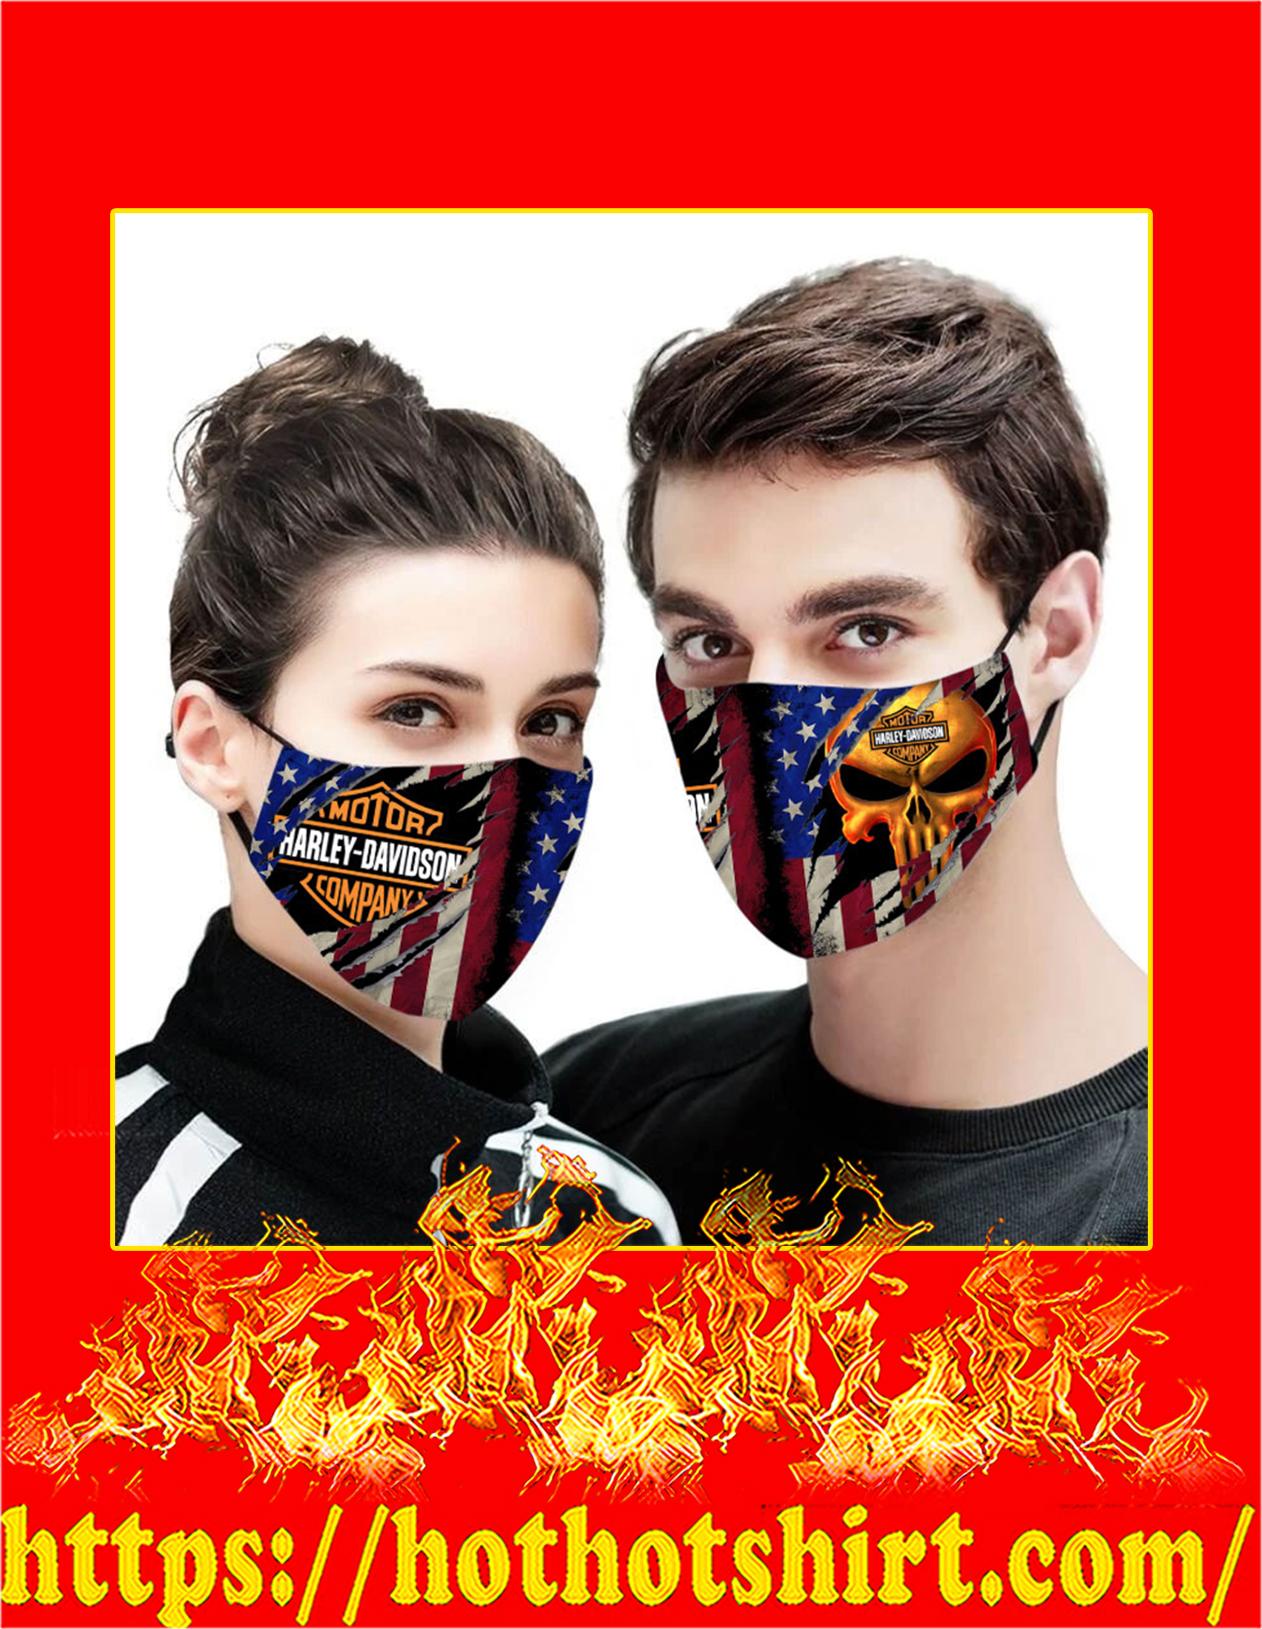 Harley-davidson punisher skull american flag face mask - detail